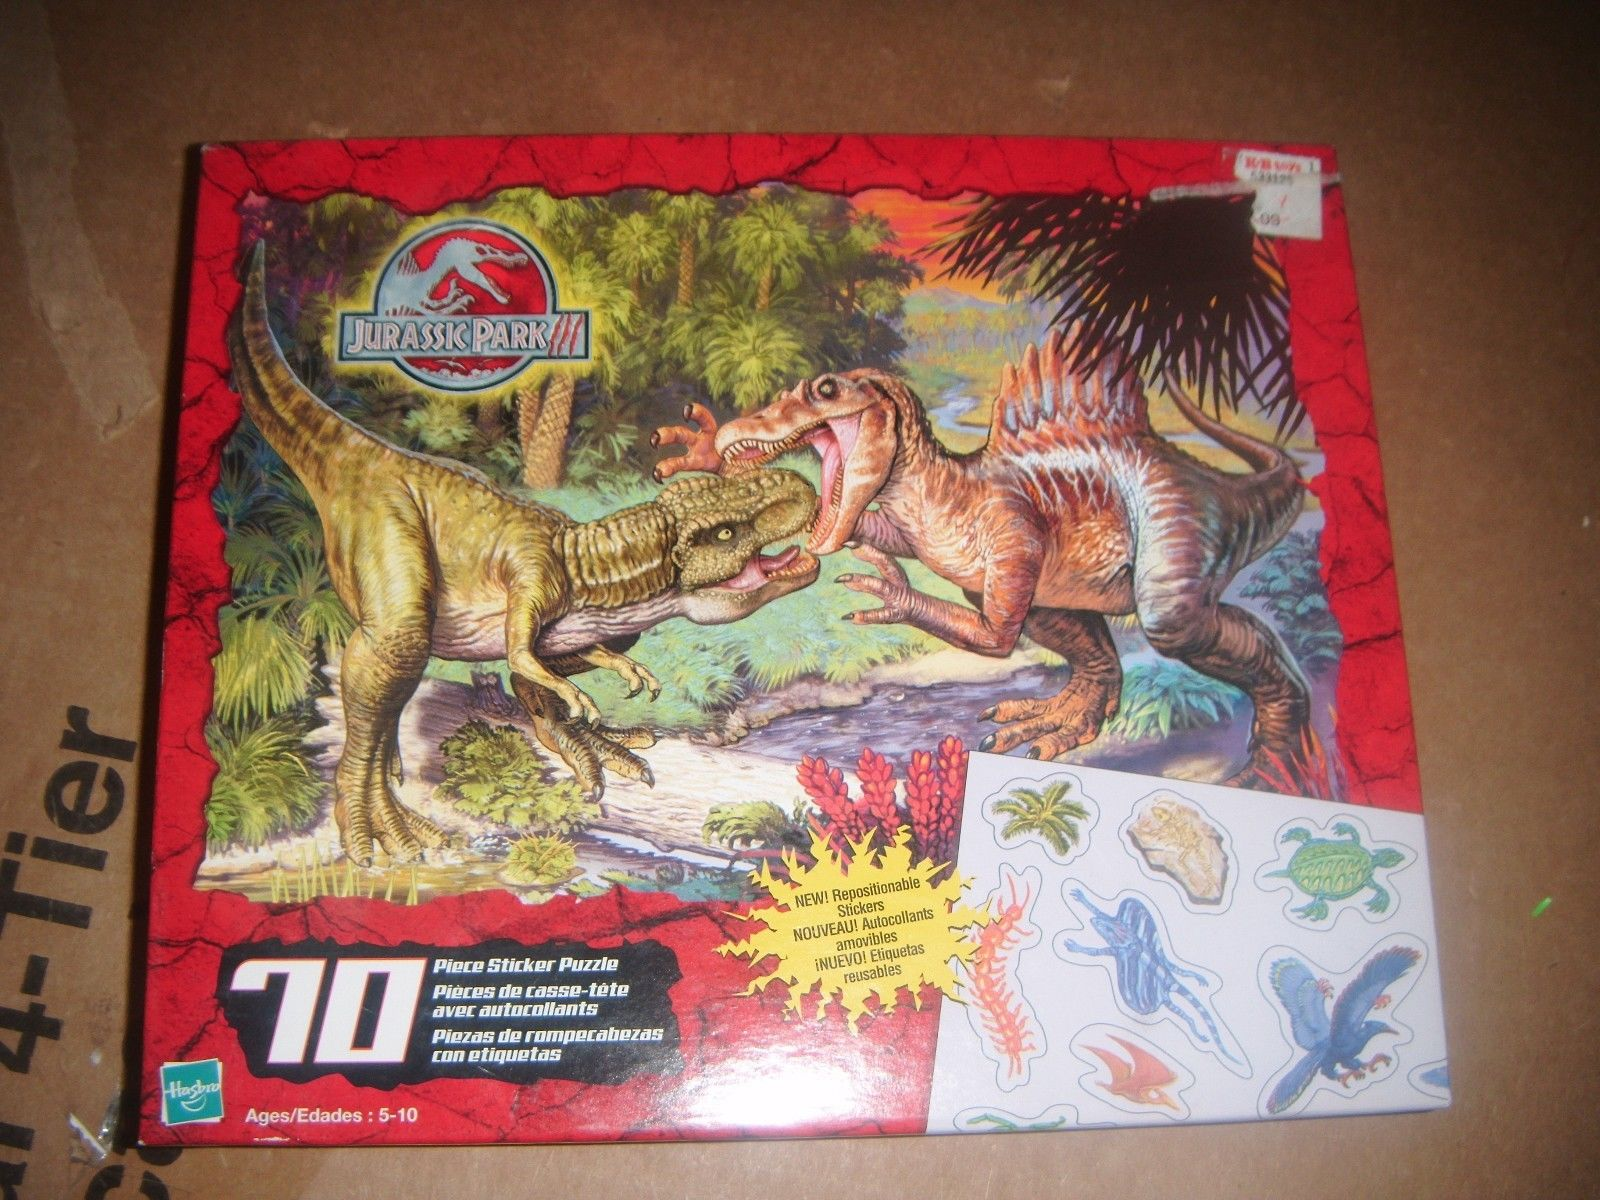 Jurassic Park 3 Hasbro Rompecabezas Jurassic Park Wiki Fandom